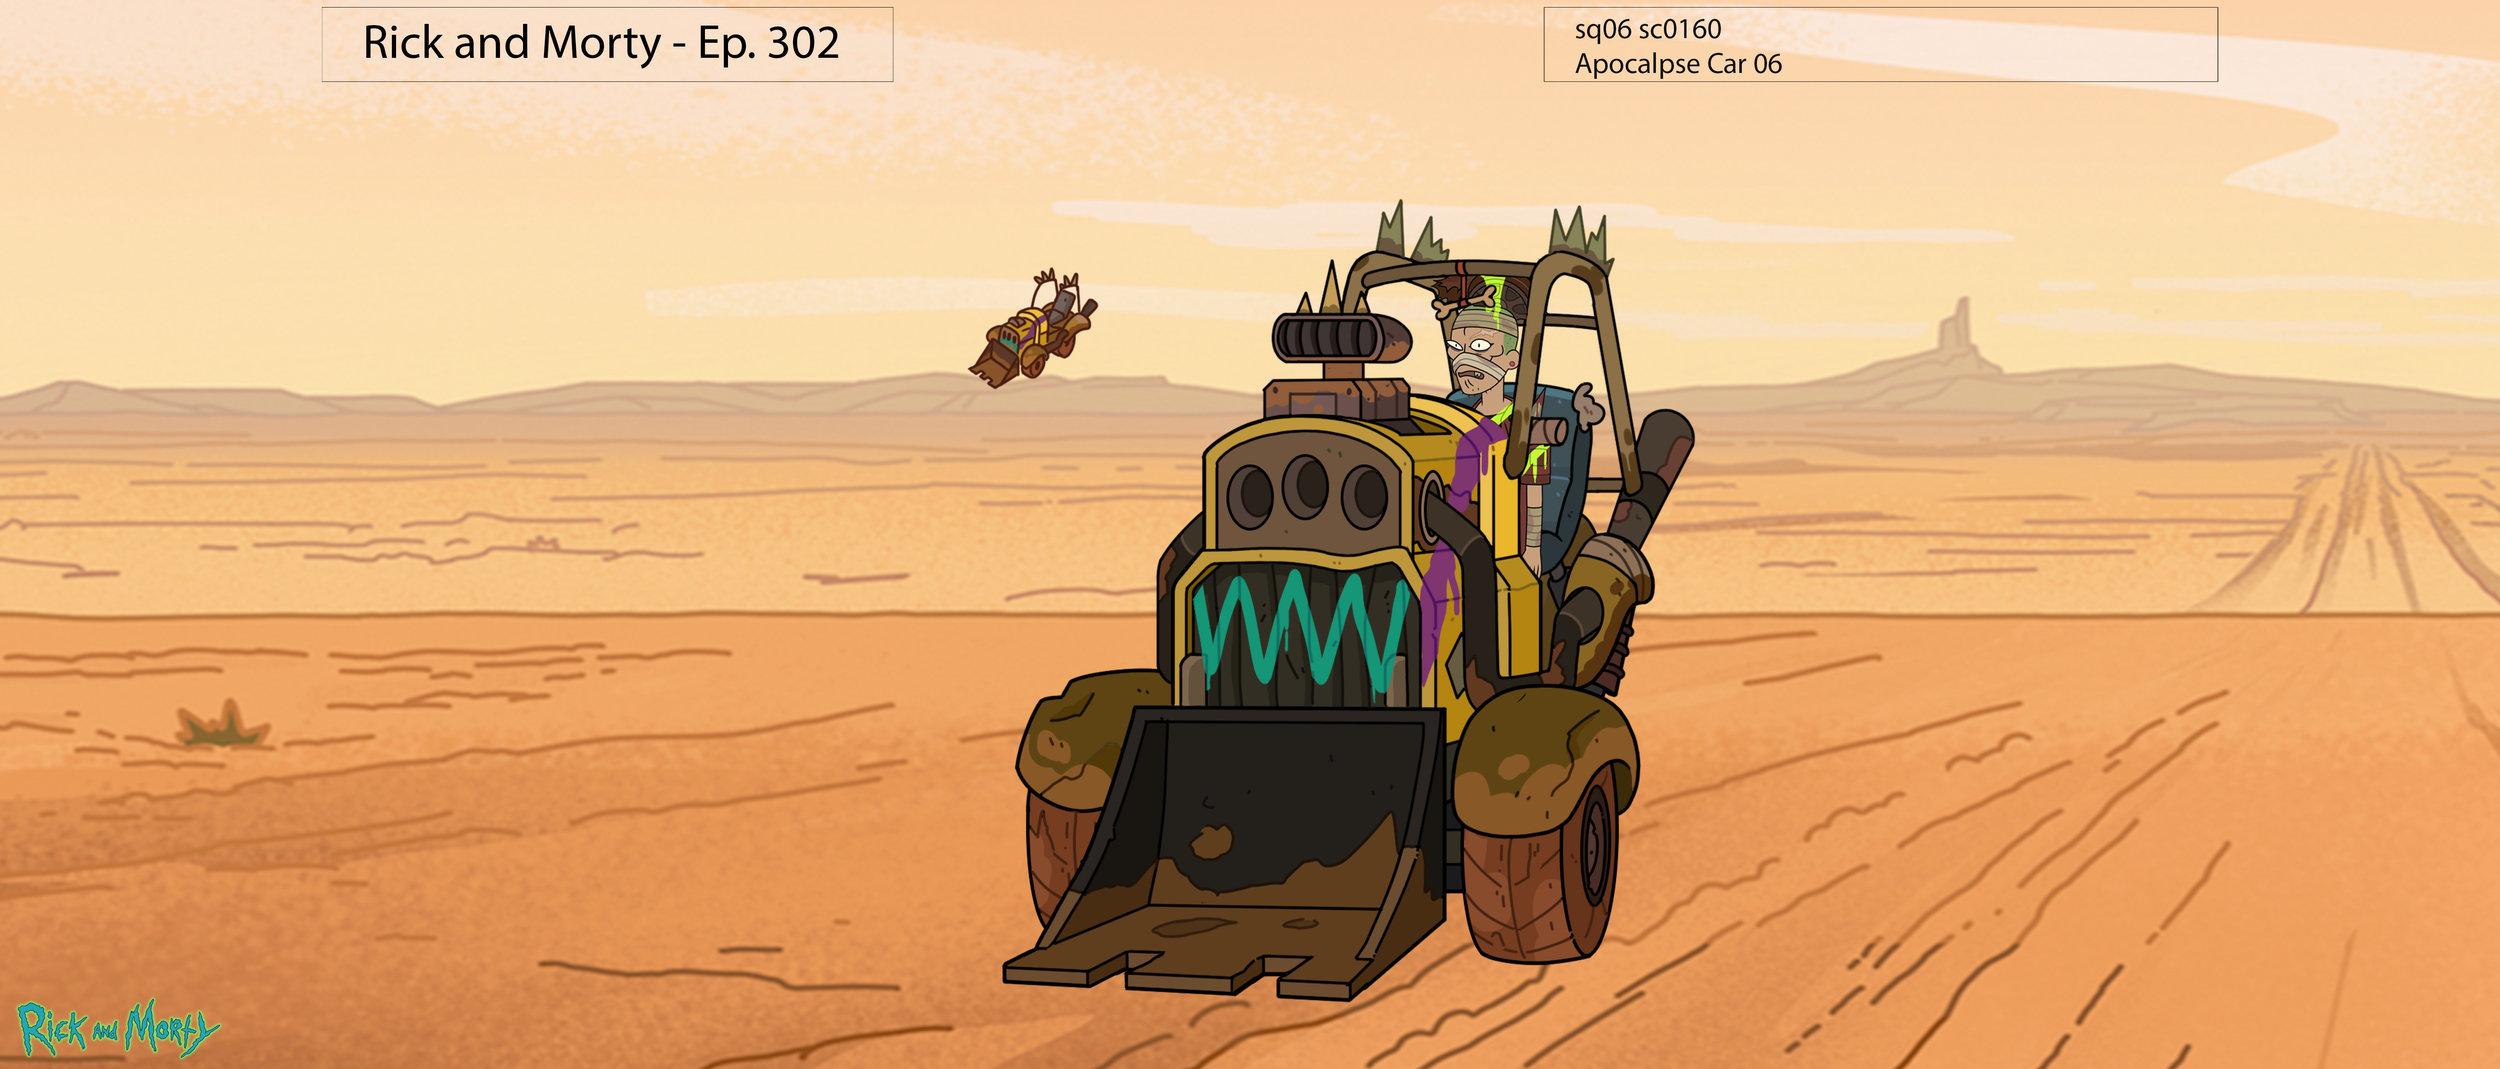 302_PR_sq06sc159_Apocalypse_Car_06_Color_V3_CB 2.jpg